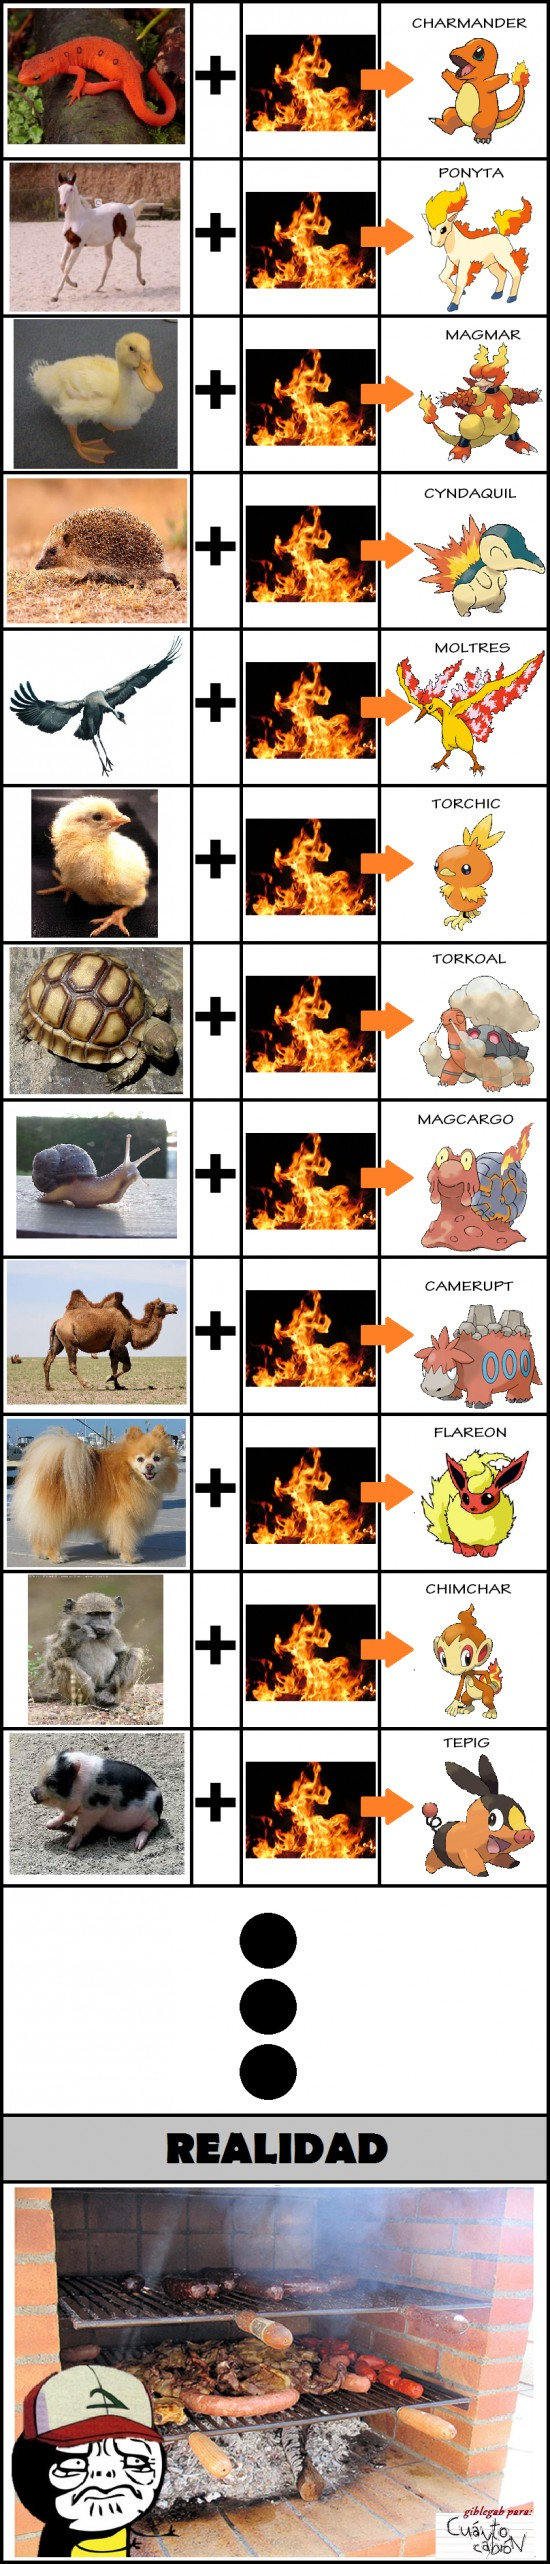 Mentira - Pokémon de fuego